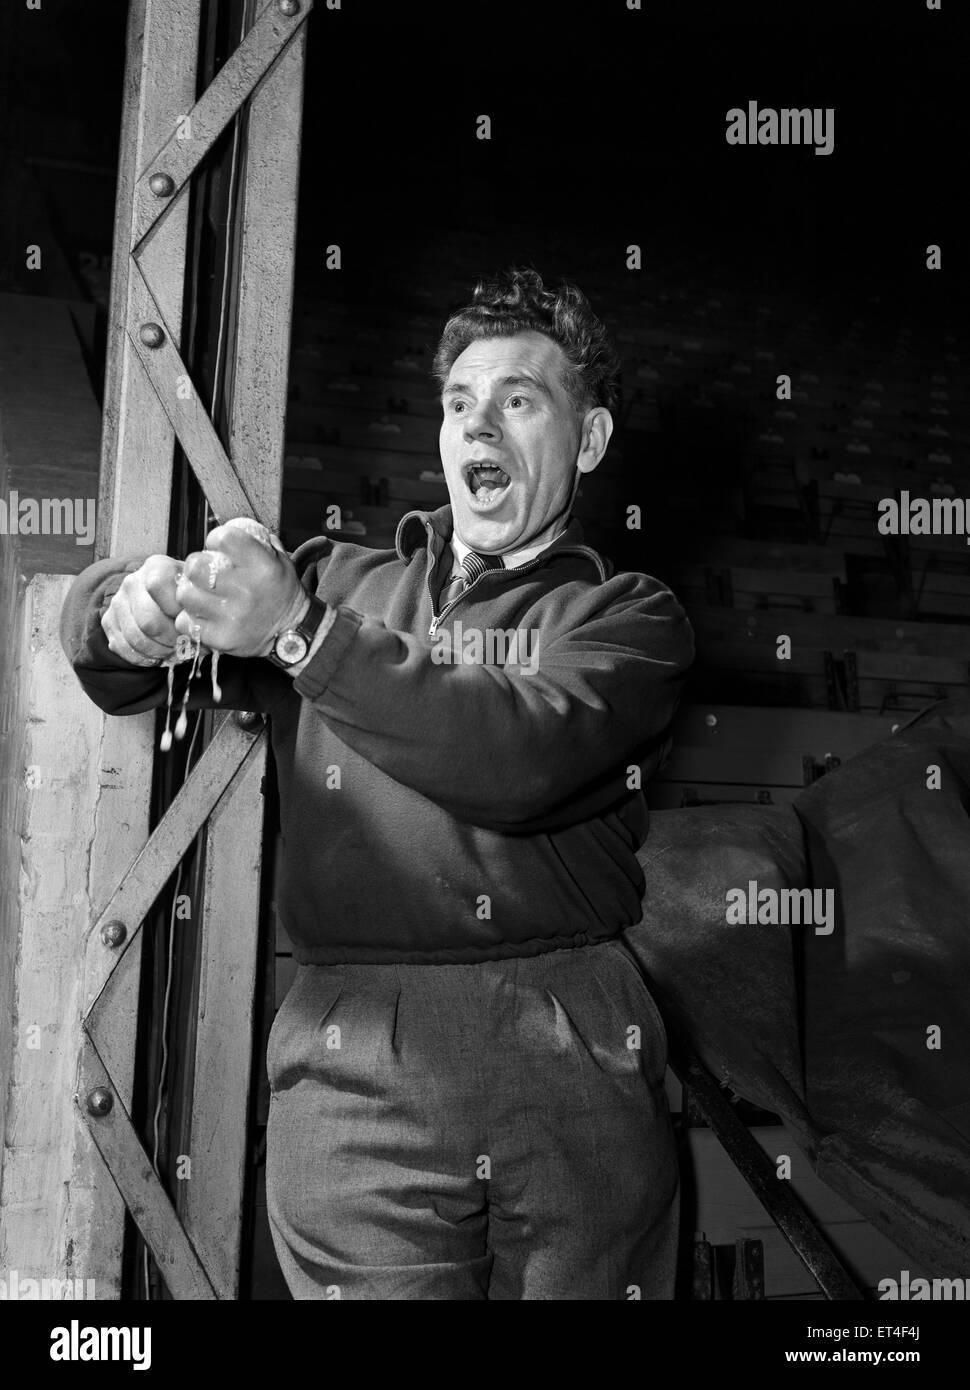 Charlton Athletic  trainer Jimmy Trotter. 20th November 1952. - Stock Image